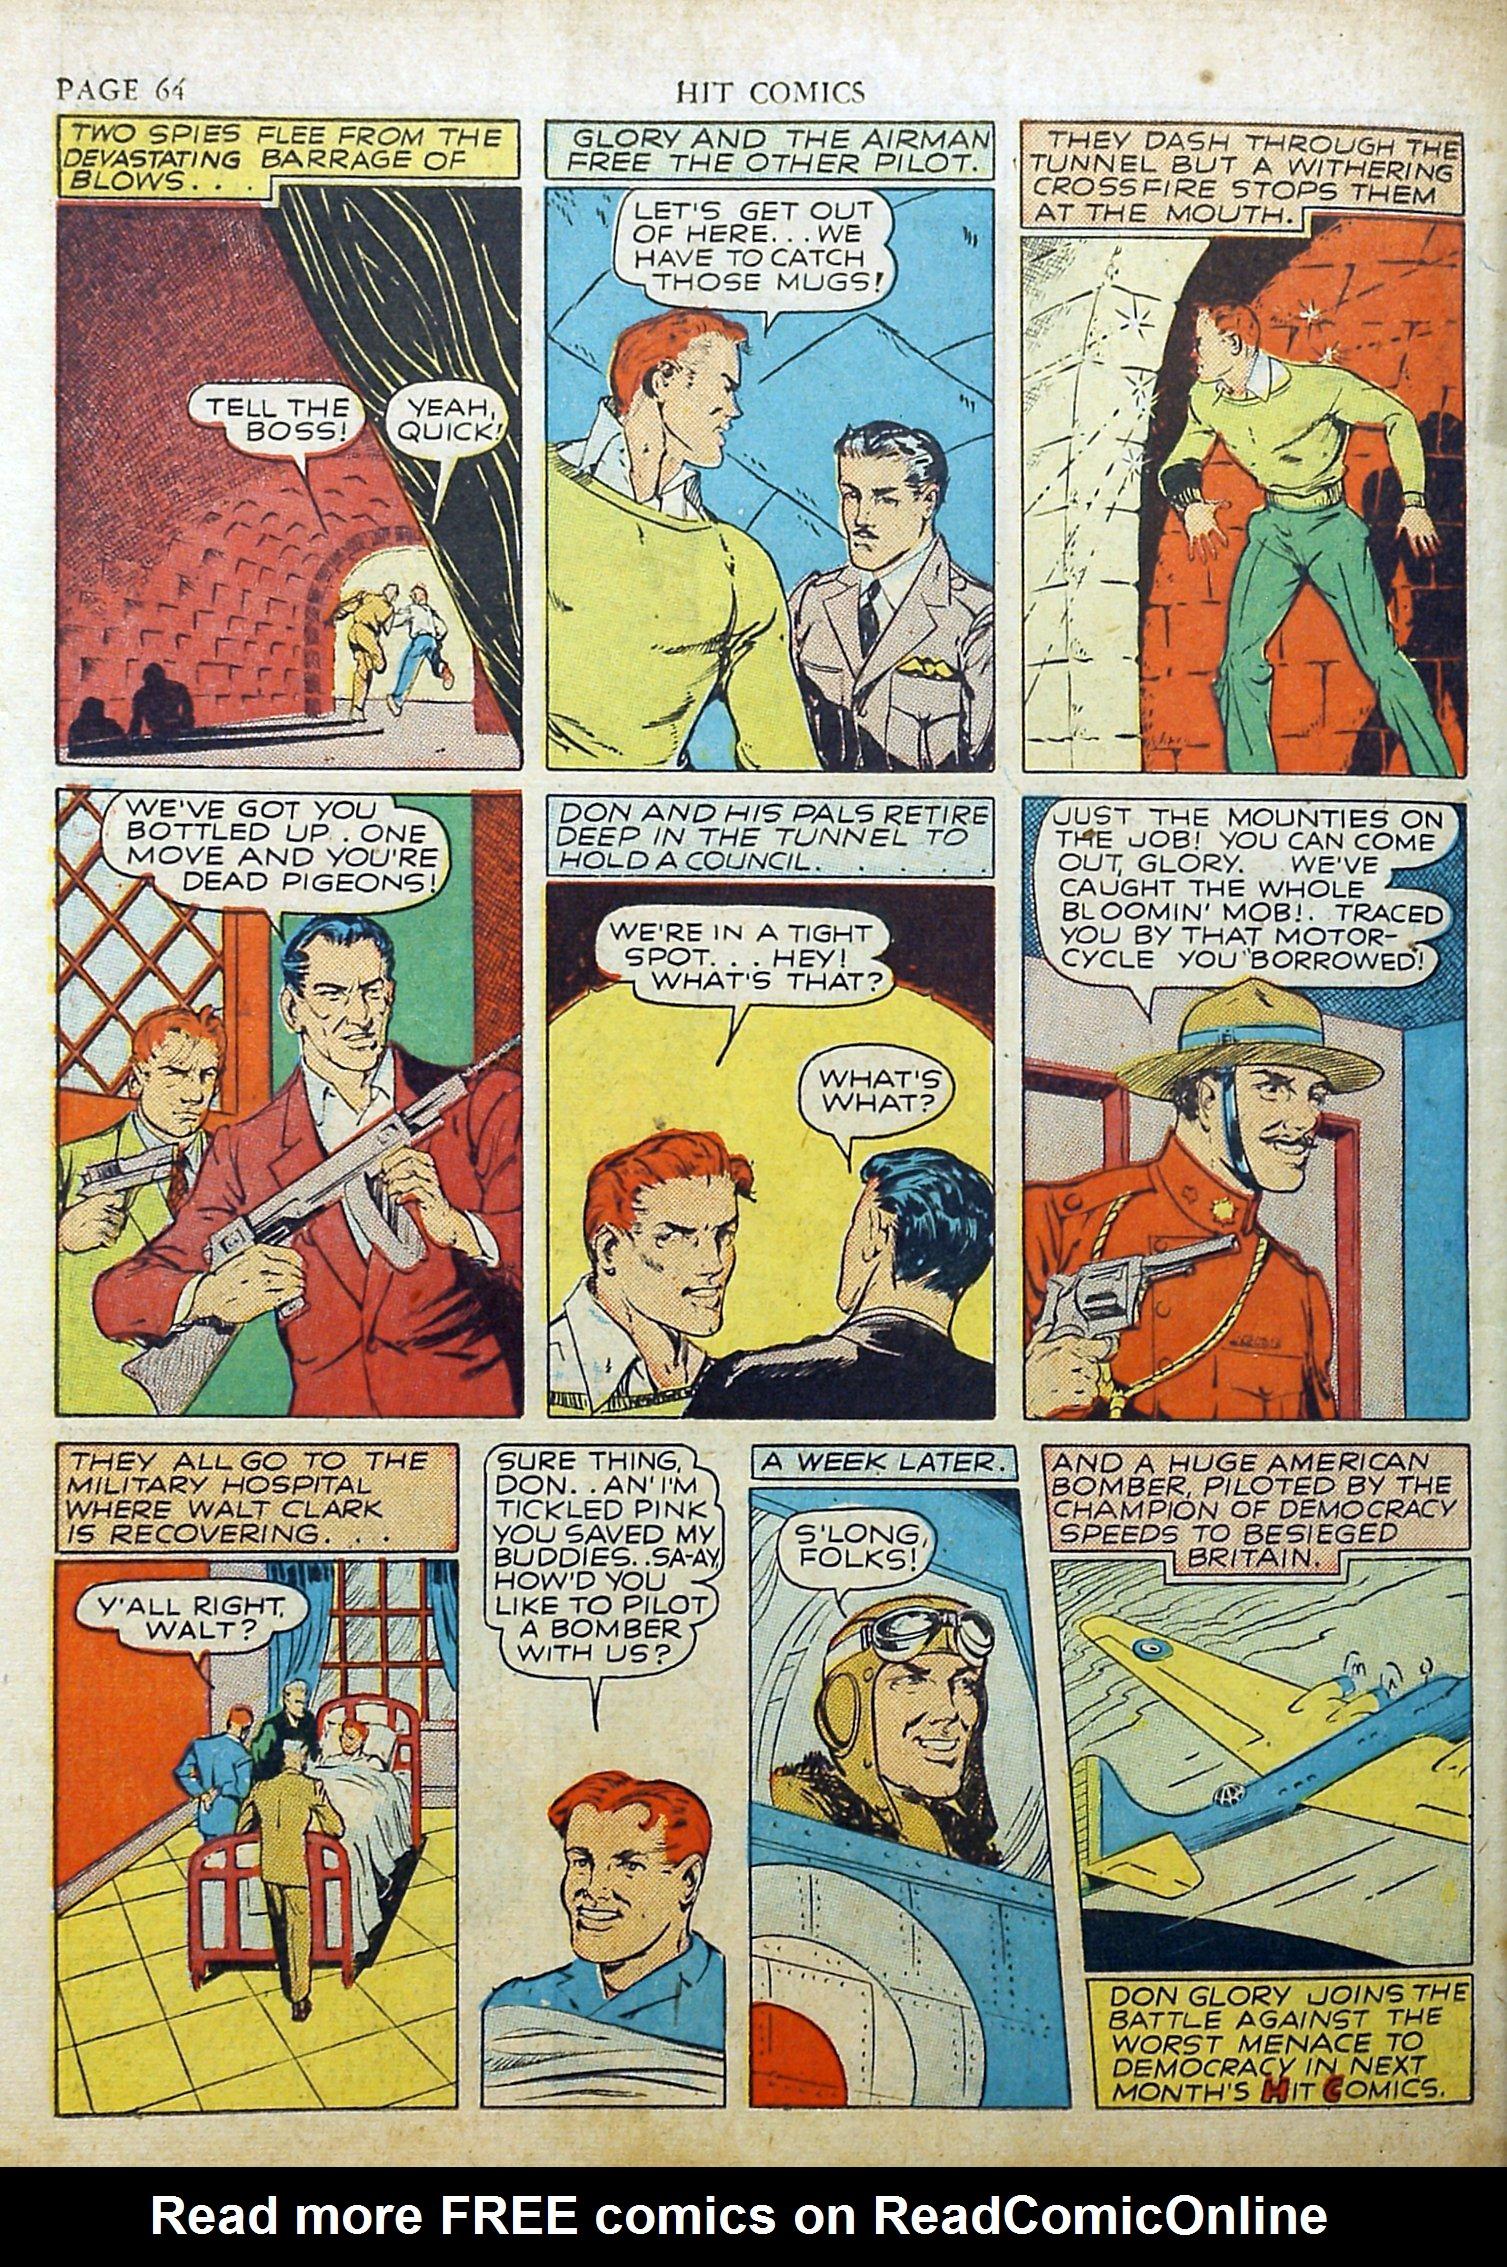 Read online Hit Comics comic -  Issue #17 - 66